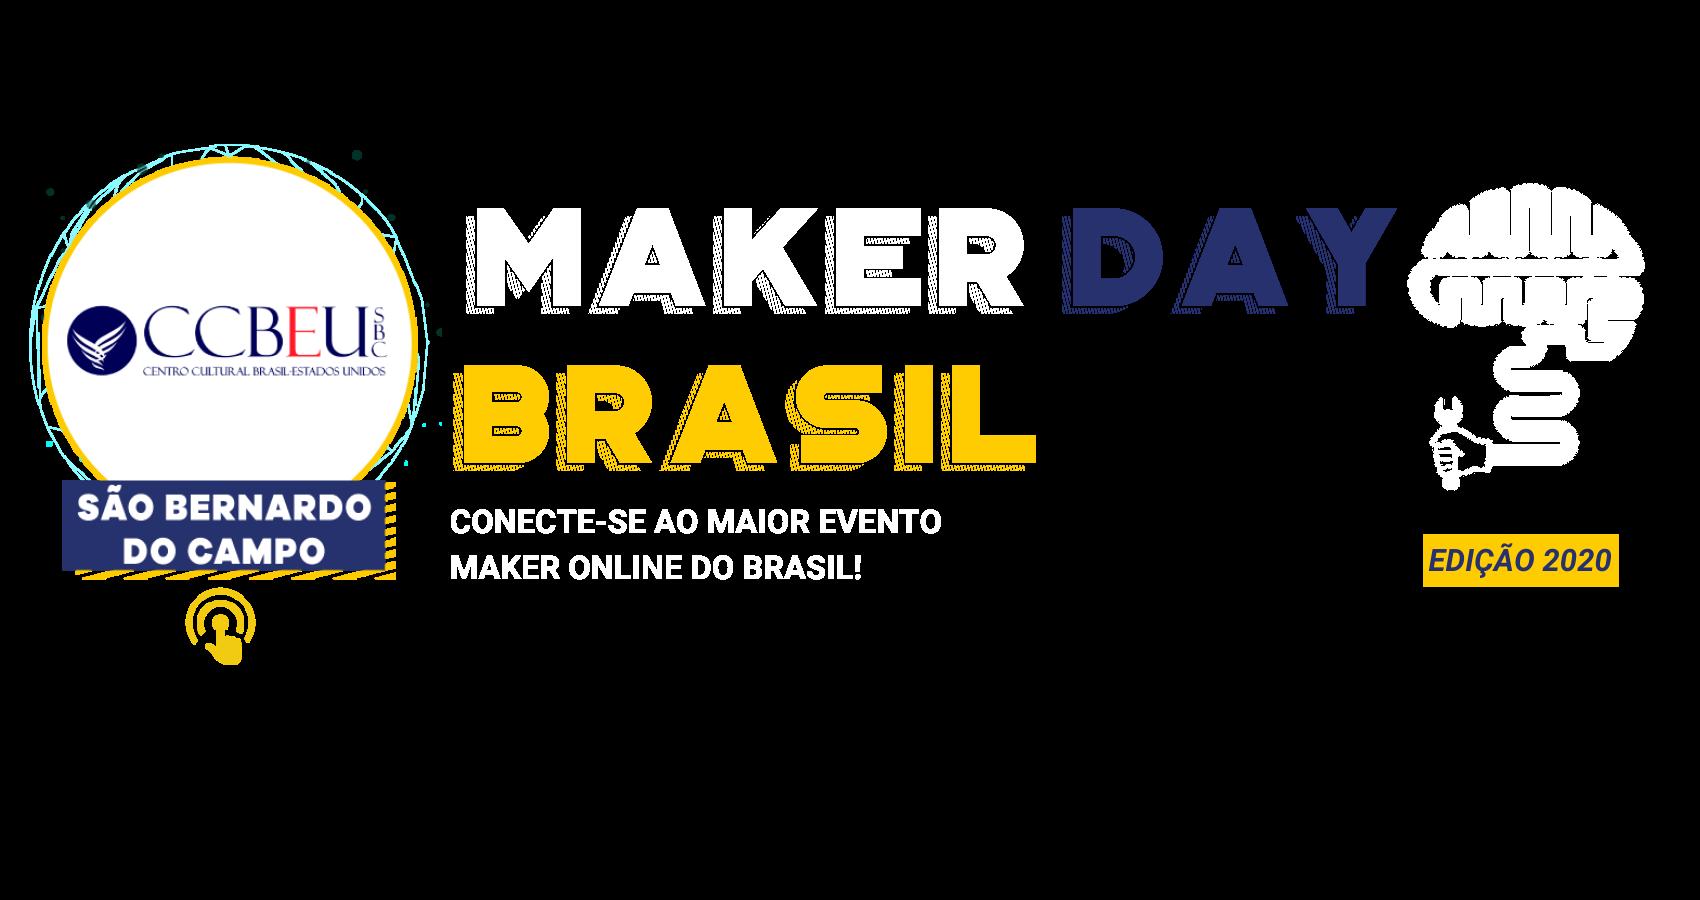 Maker Day Brasil Capa Sao Bernardo do Campo